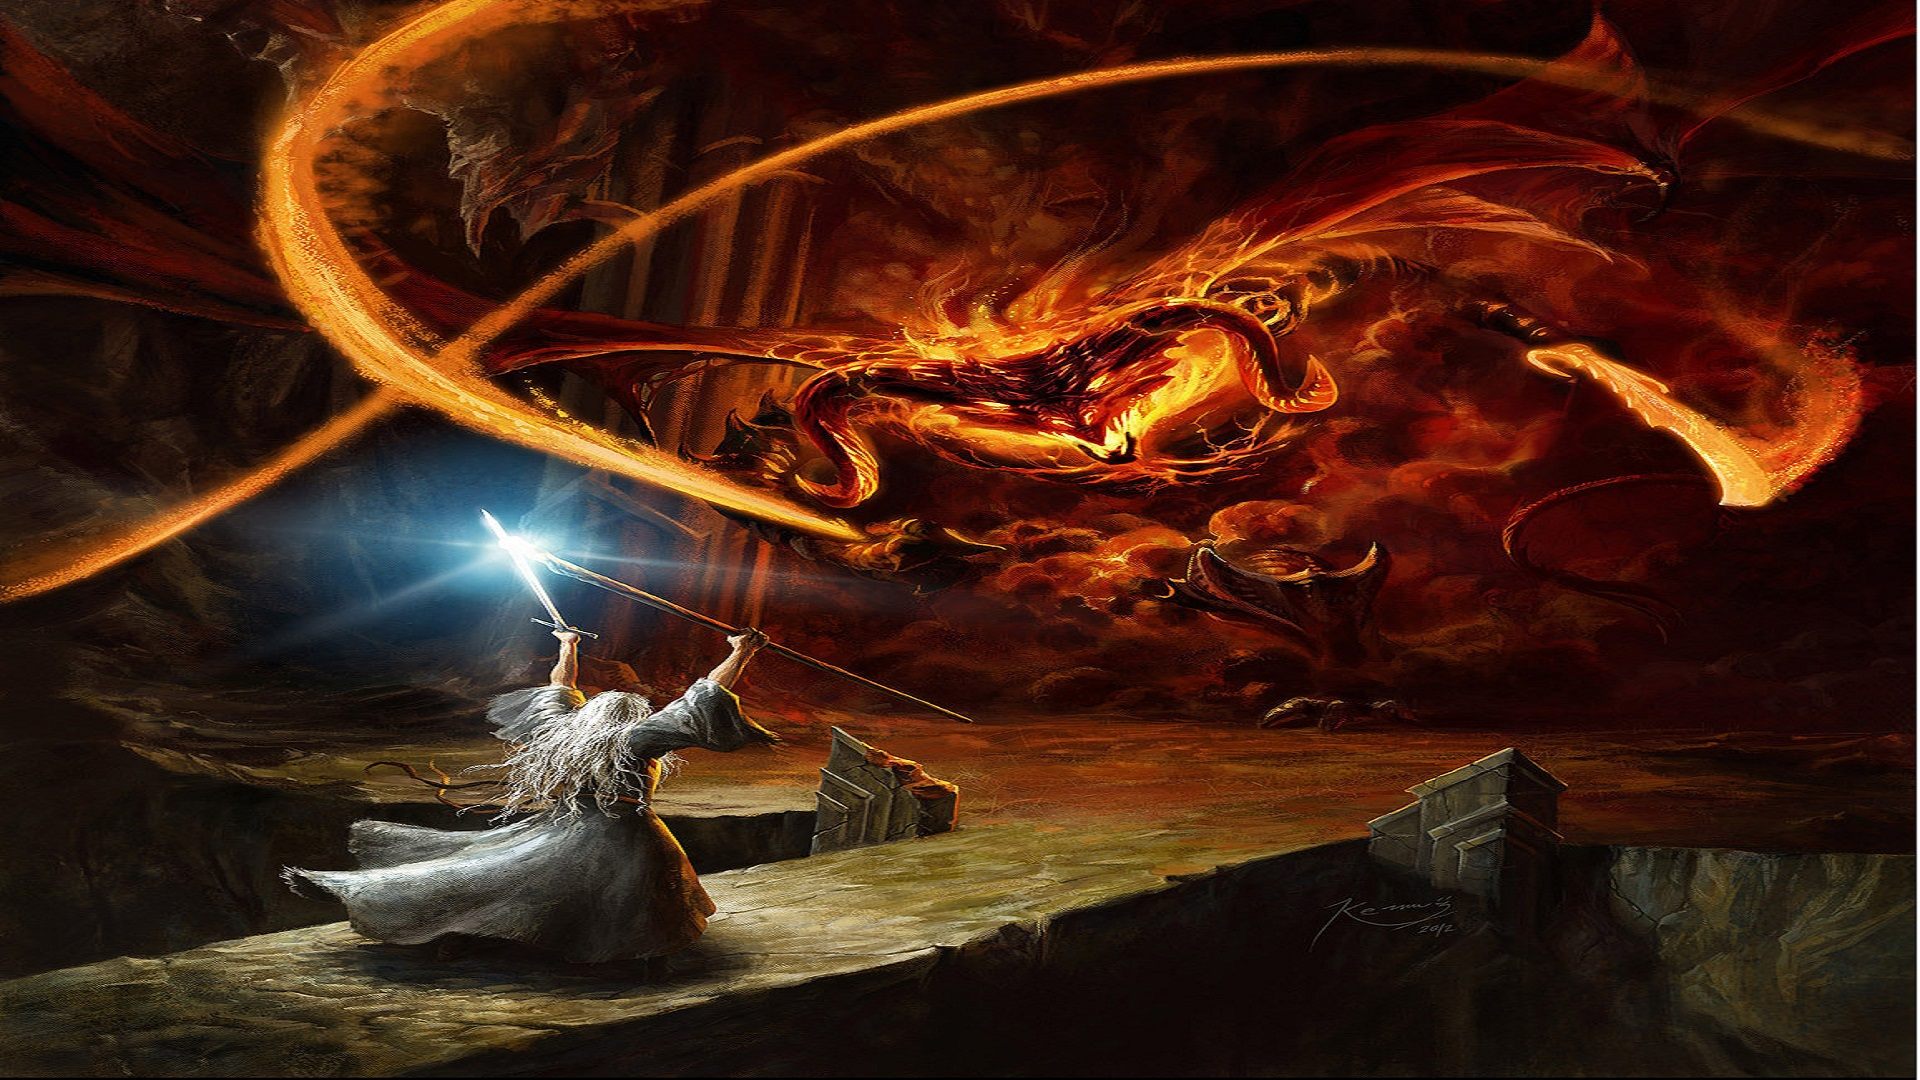 You Shall Not Pass Gandalf Wallpaper Art Image The Fellowship